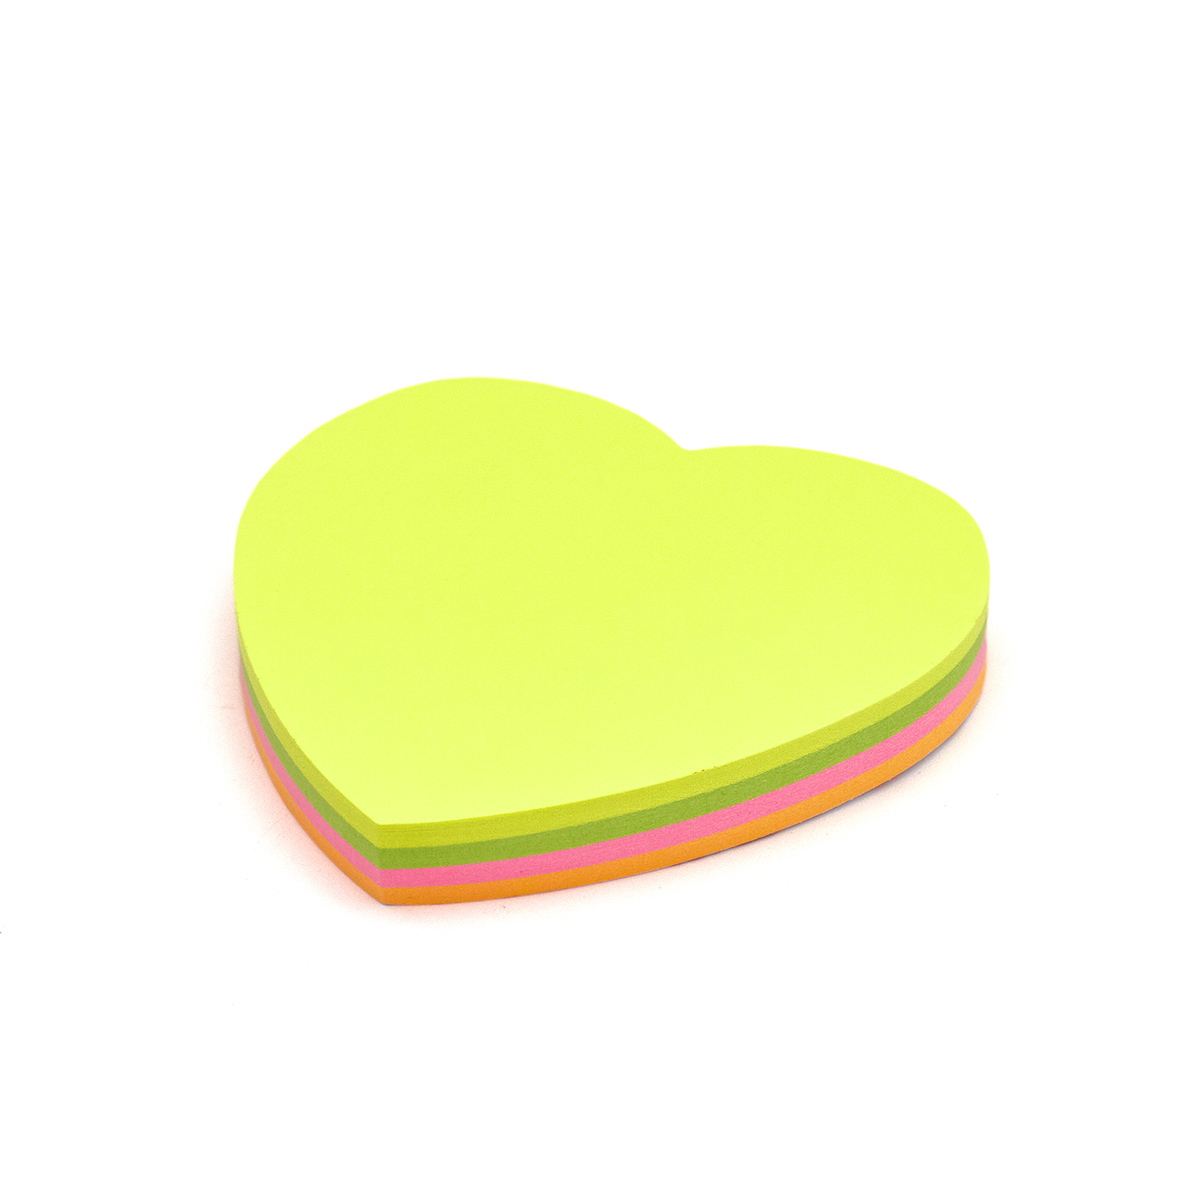 LAMARK0143 Бум/зам. фигурная Сердце 100 л.,